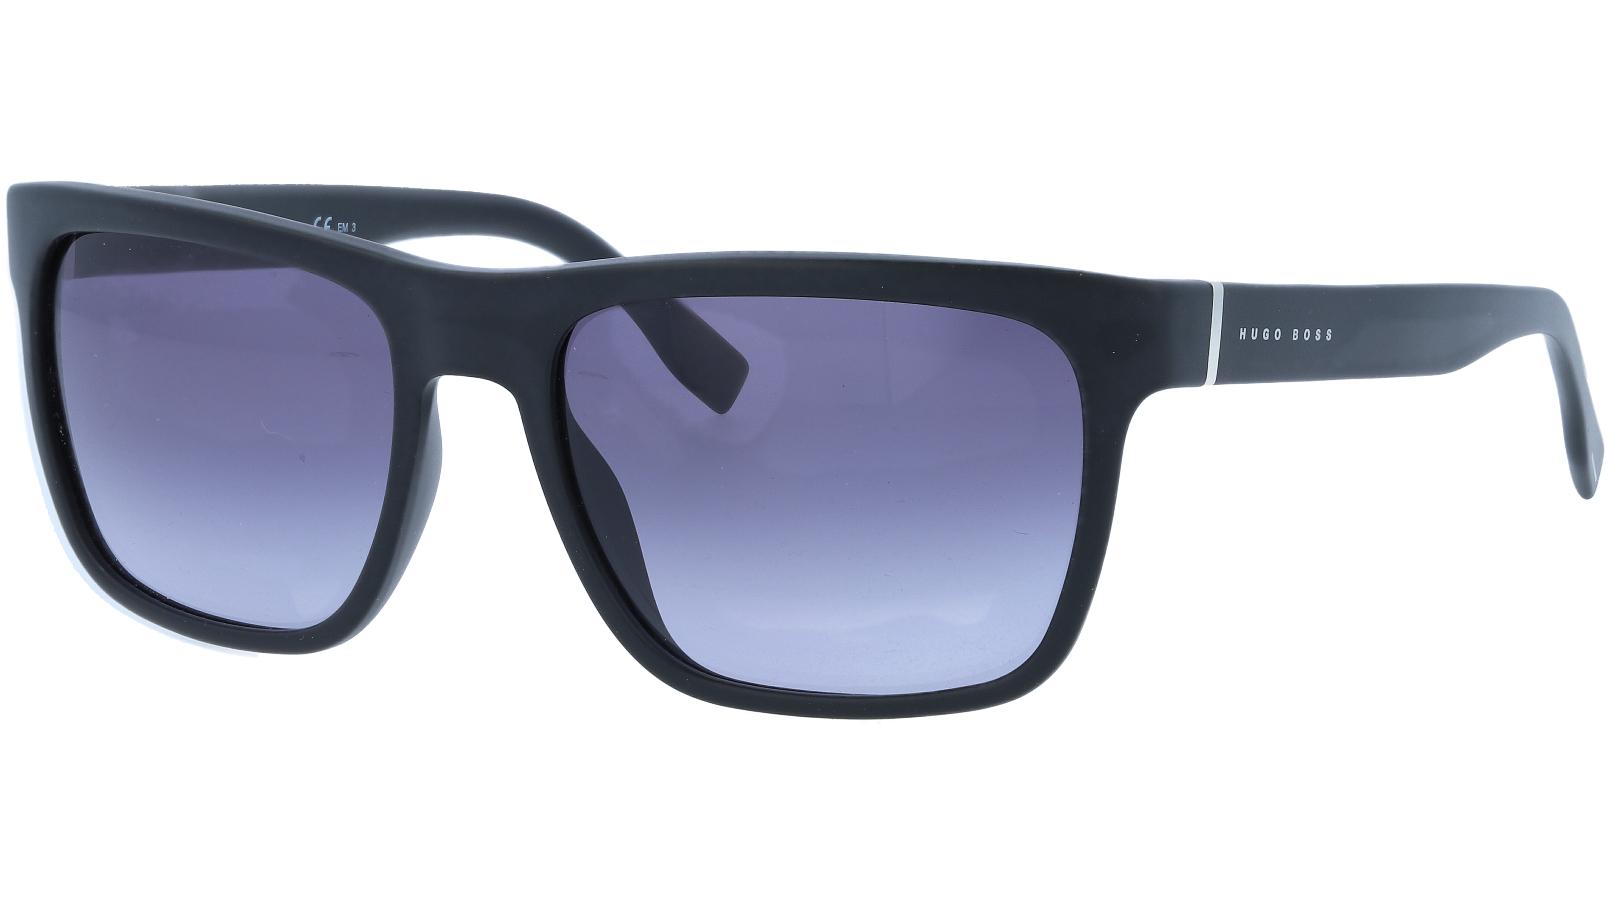 Hugo Boss BOSS0727NS 00390 56 Matt Sunglasses